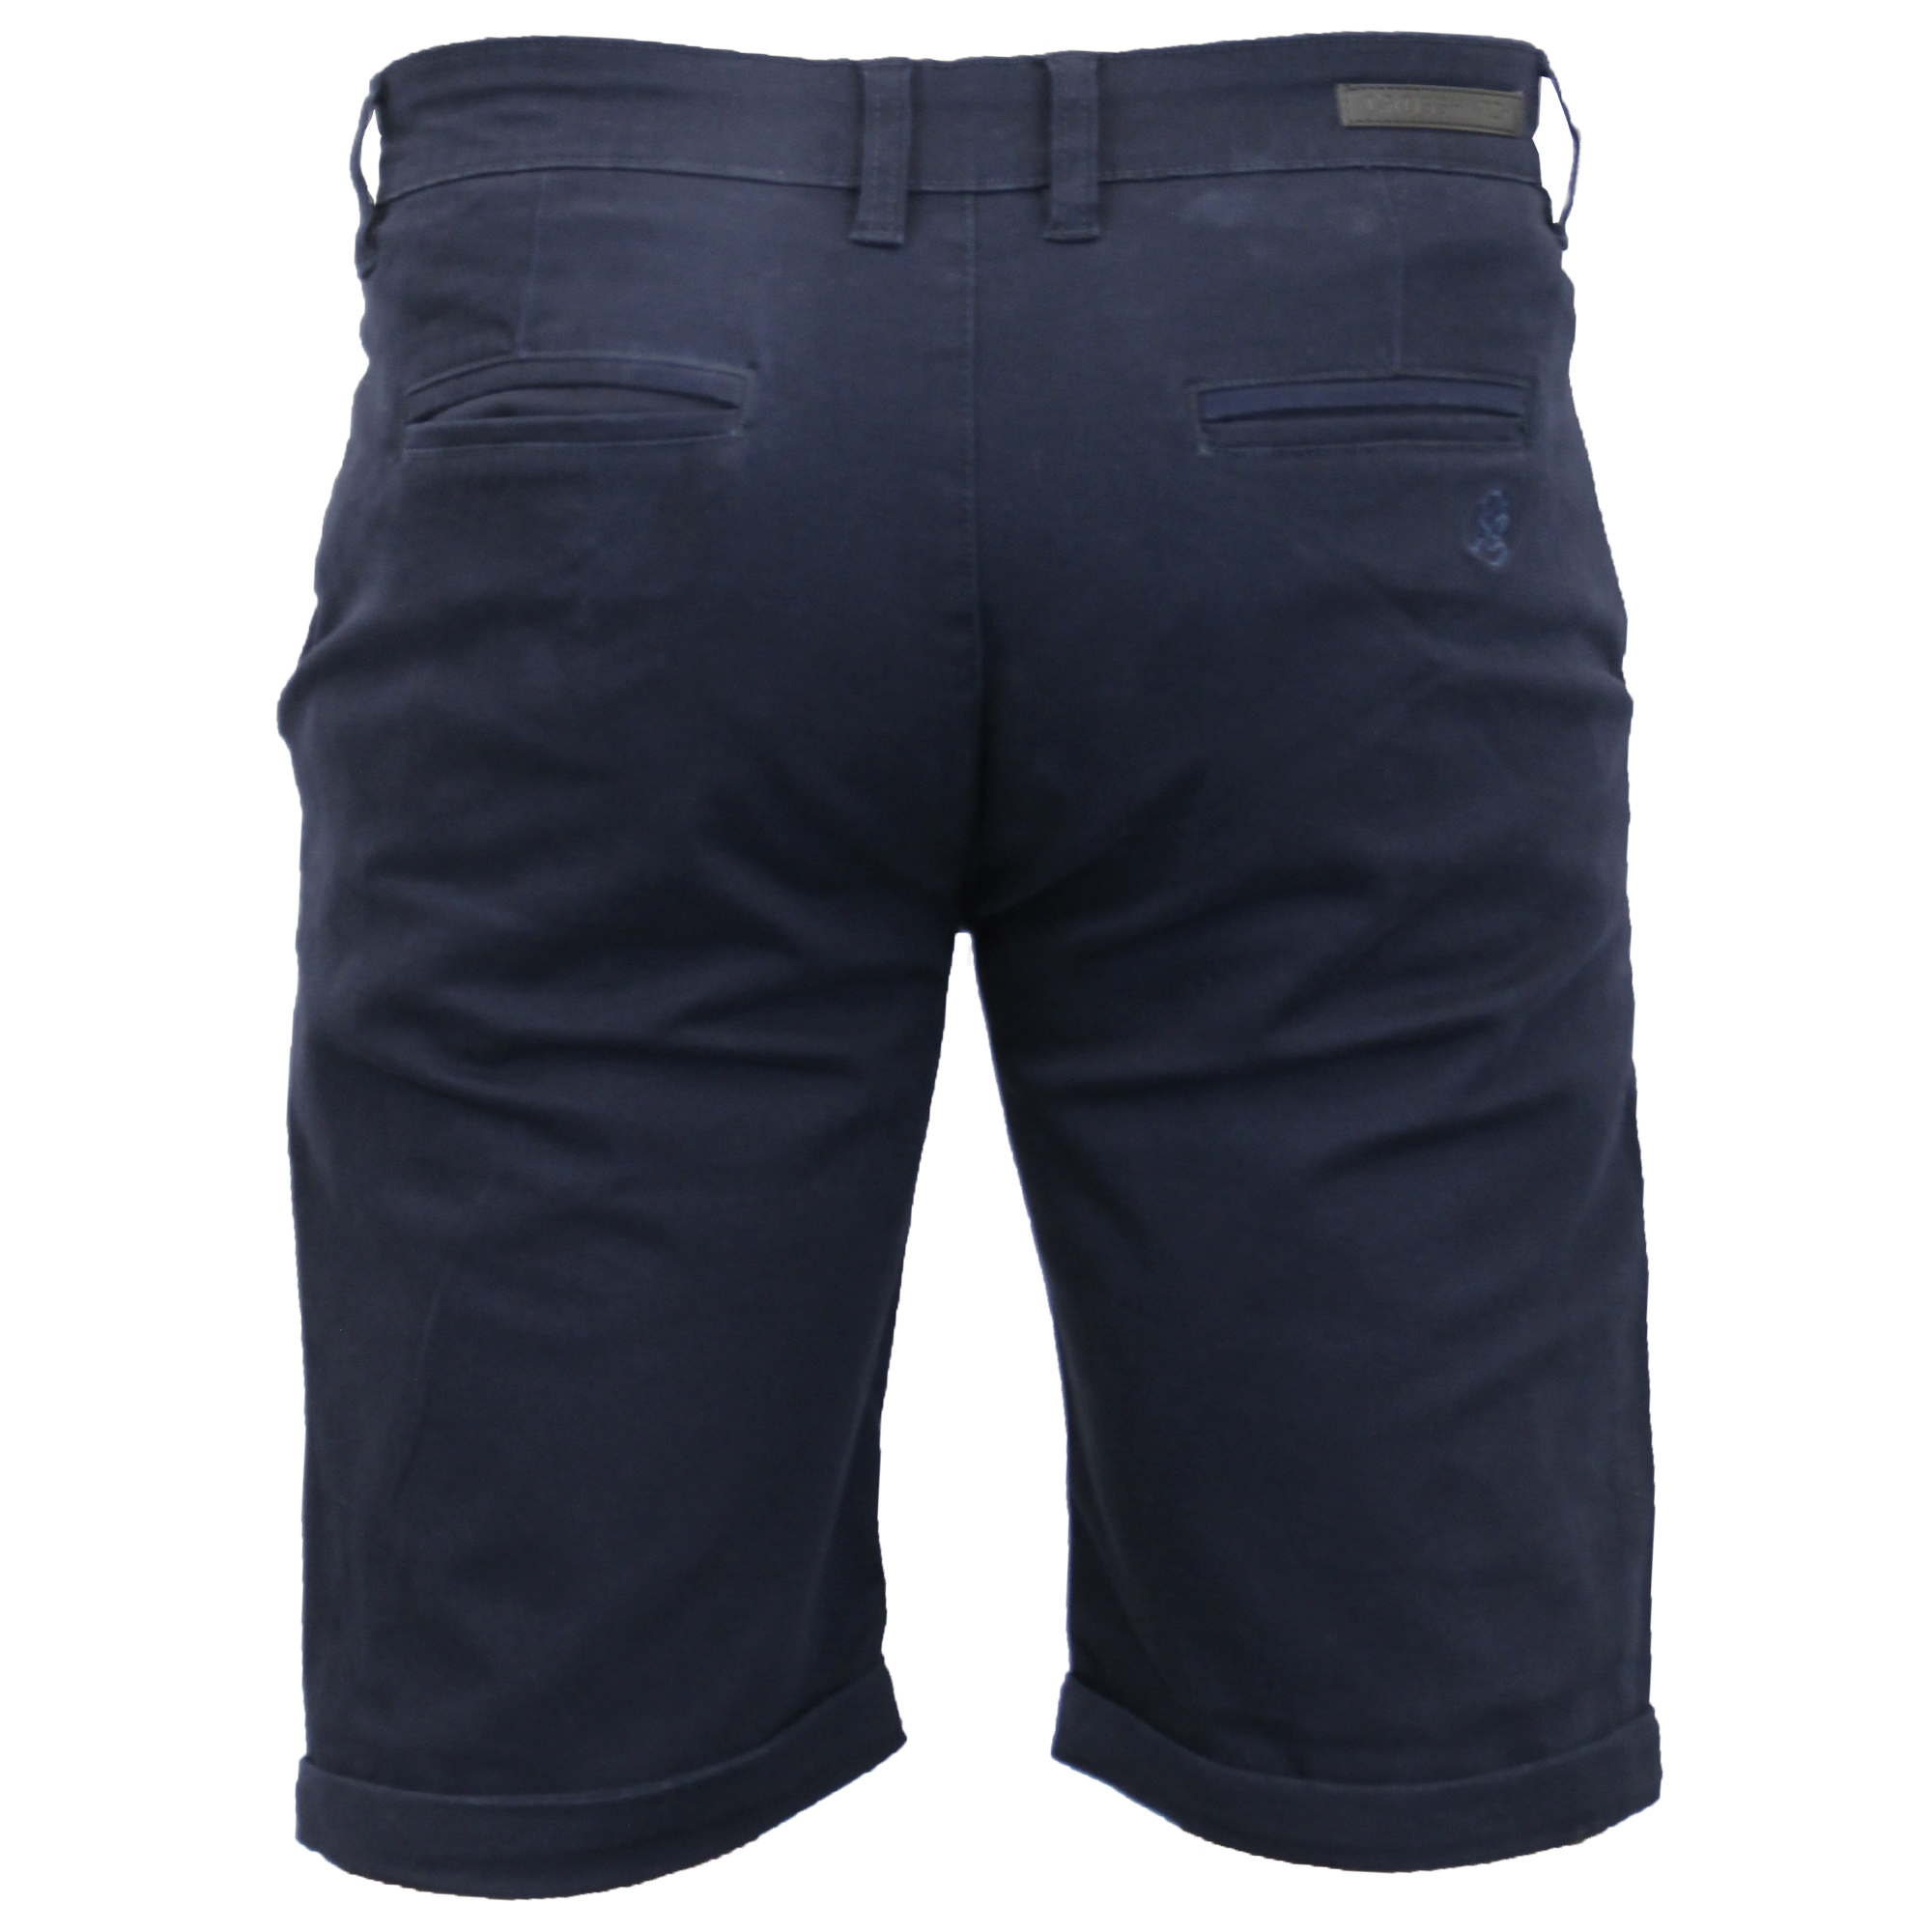 thumbnail 6 - Mens-Chino-Shorts-Crosshatch-Brandons-Knee-Length-Fastrack-Roll-Up-Summer-New